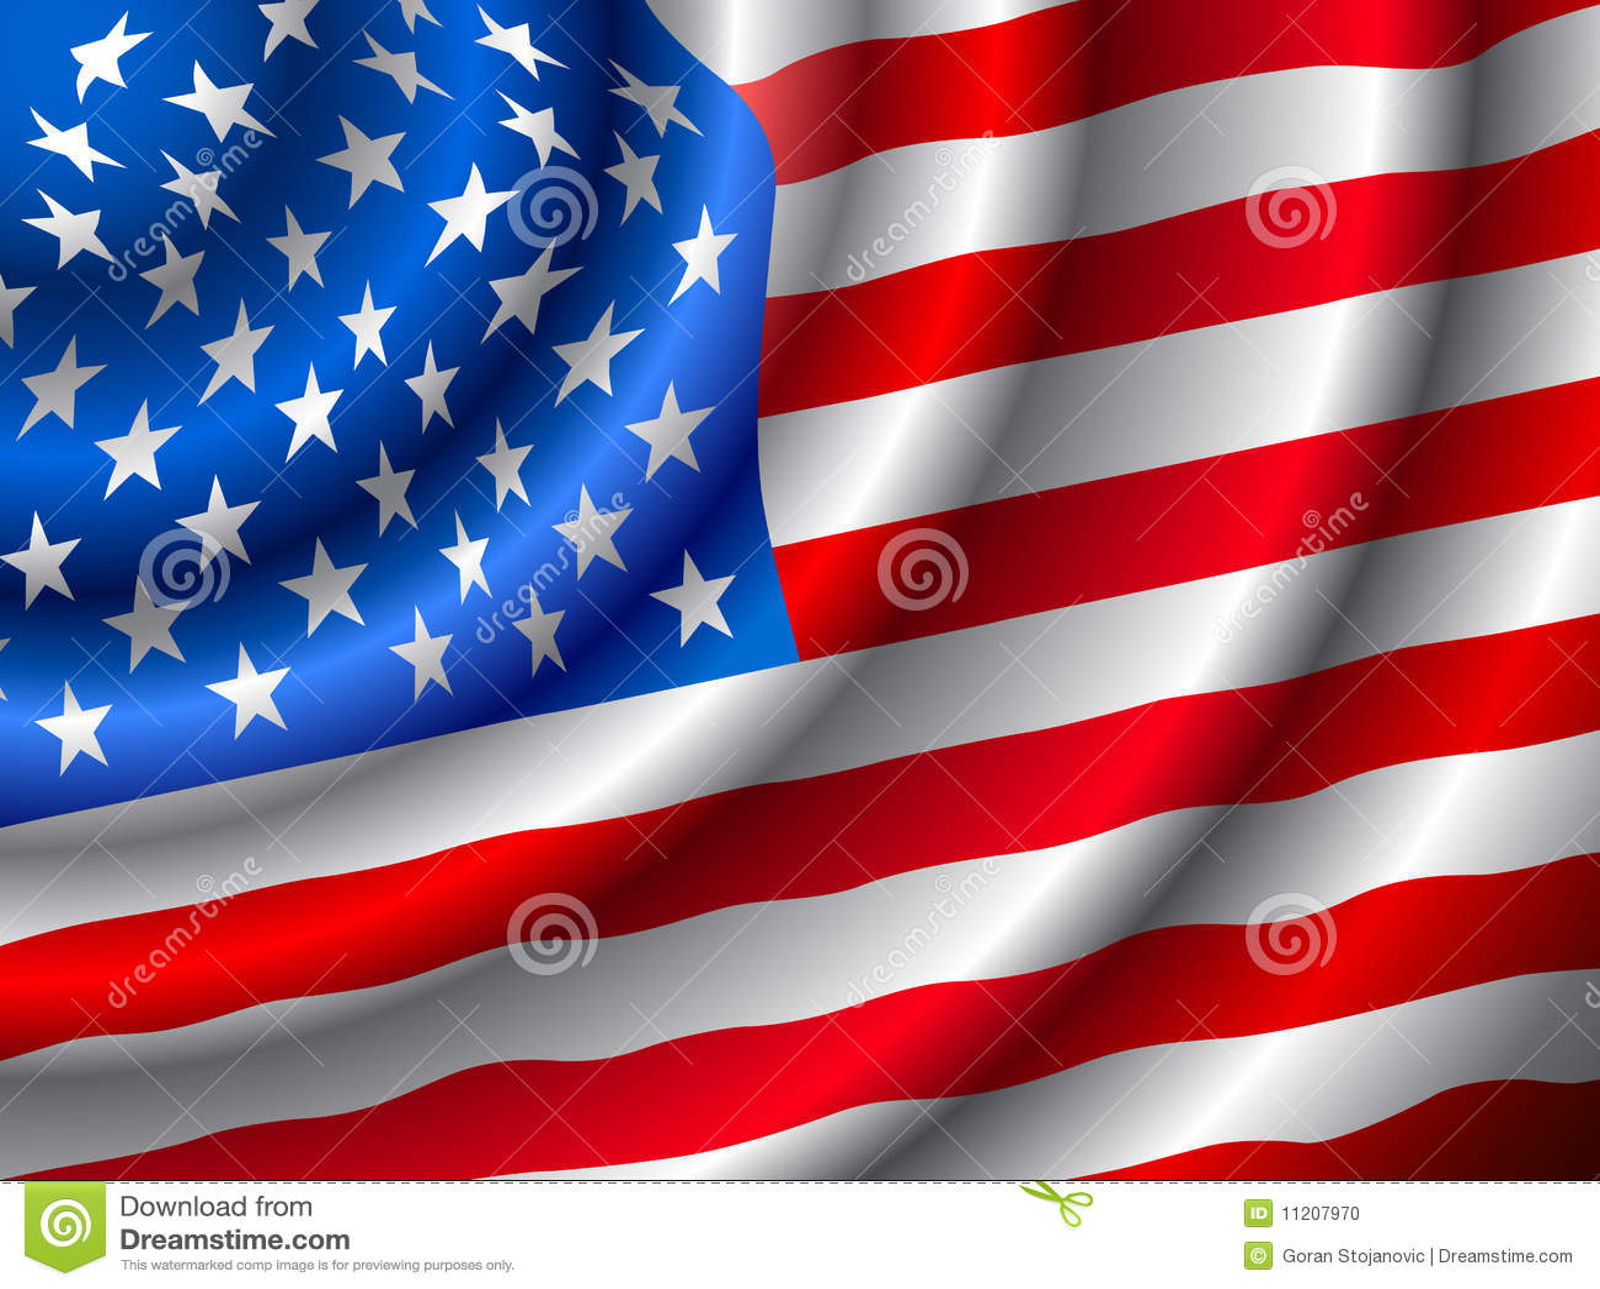 VECTOR American Flag Waving In The Wind Stock Vector ...